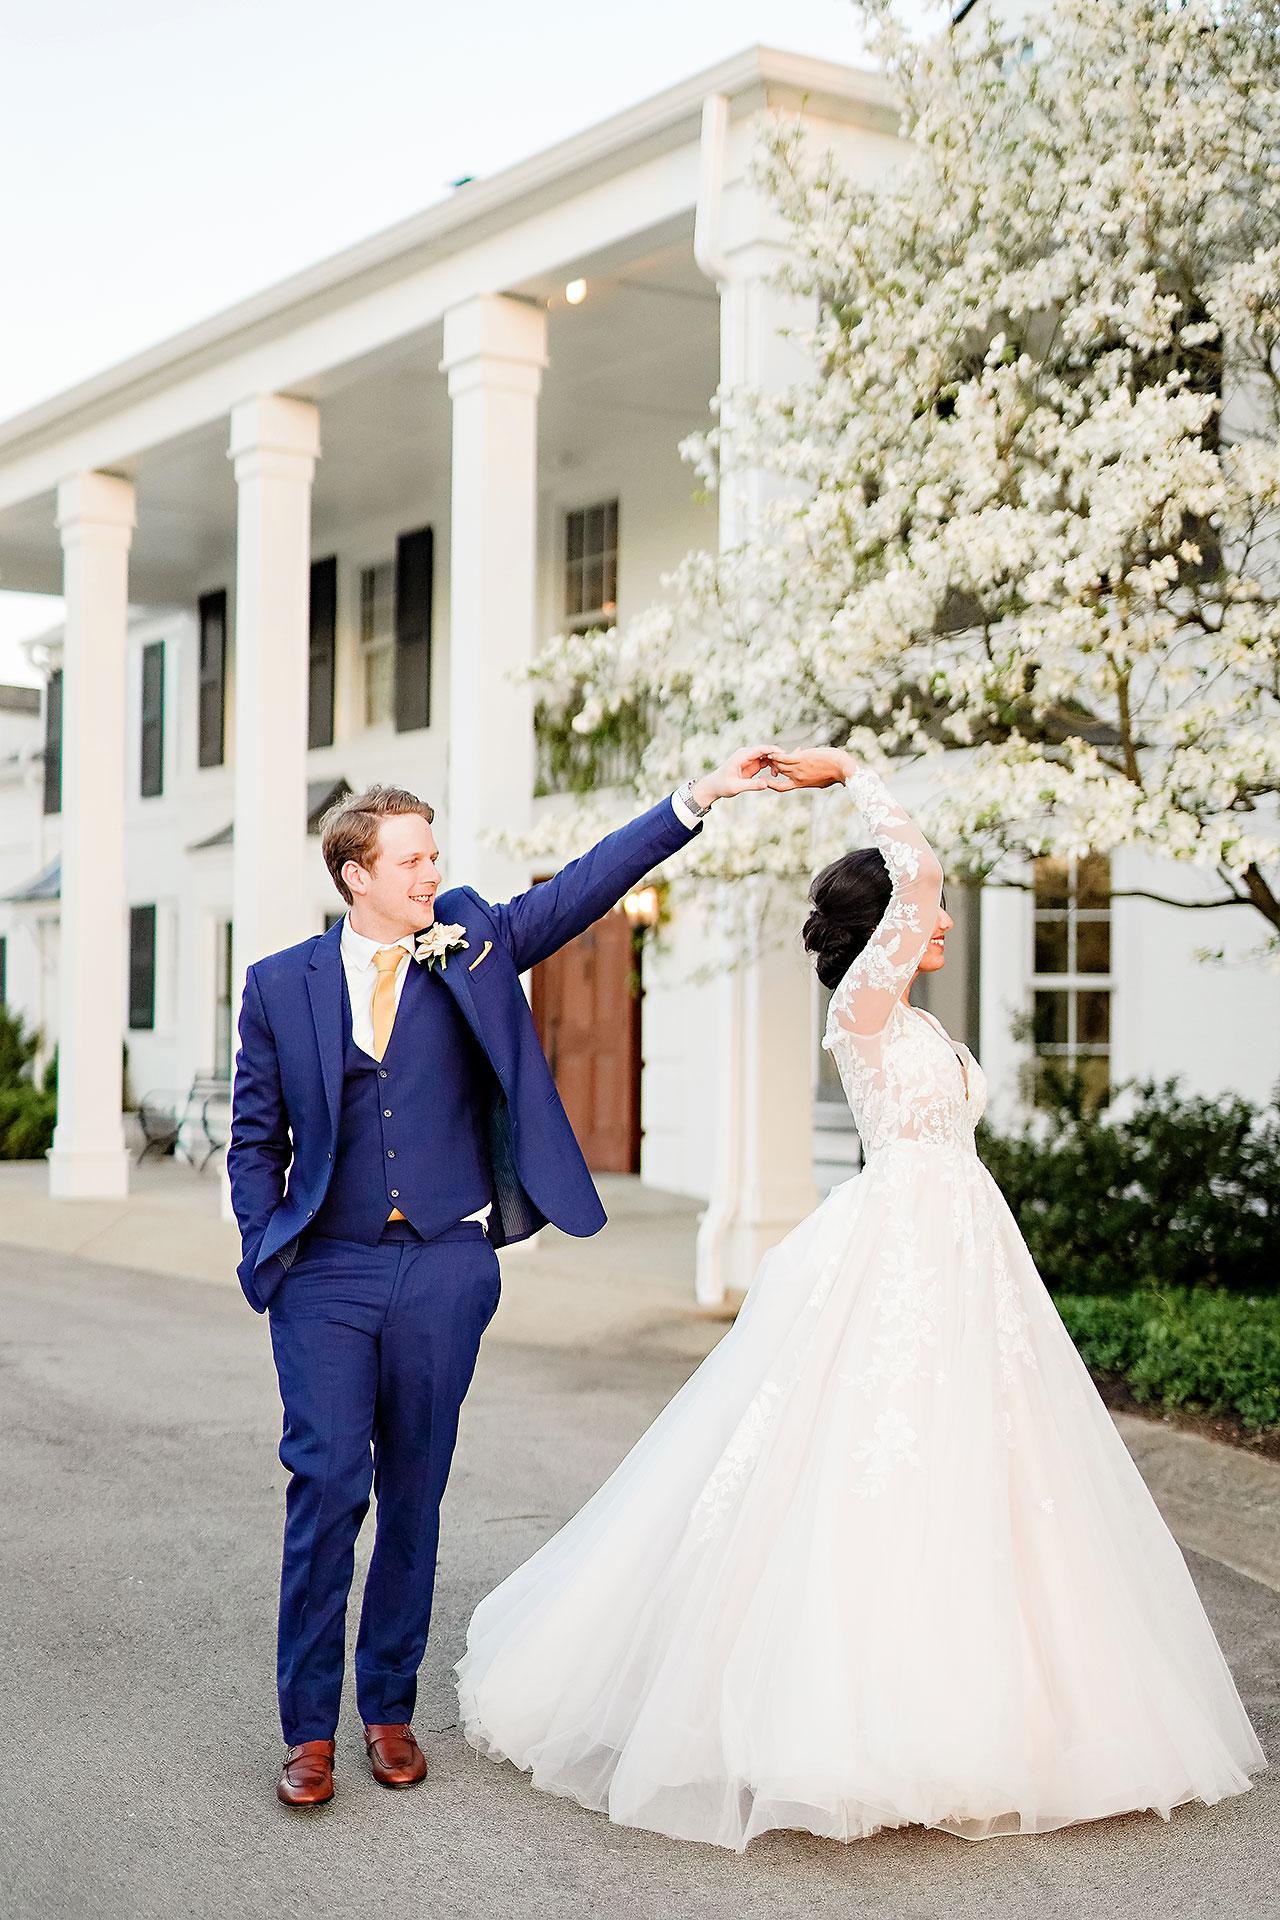 Nadia Parker Black Iris Estate Carmel Indiana Wedding May 2021 262